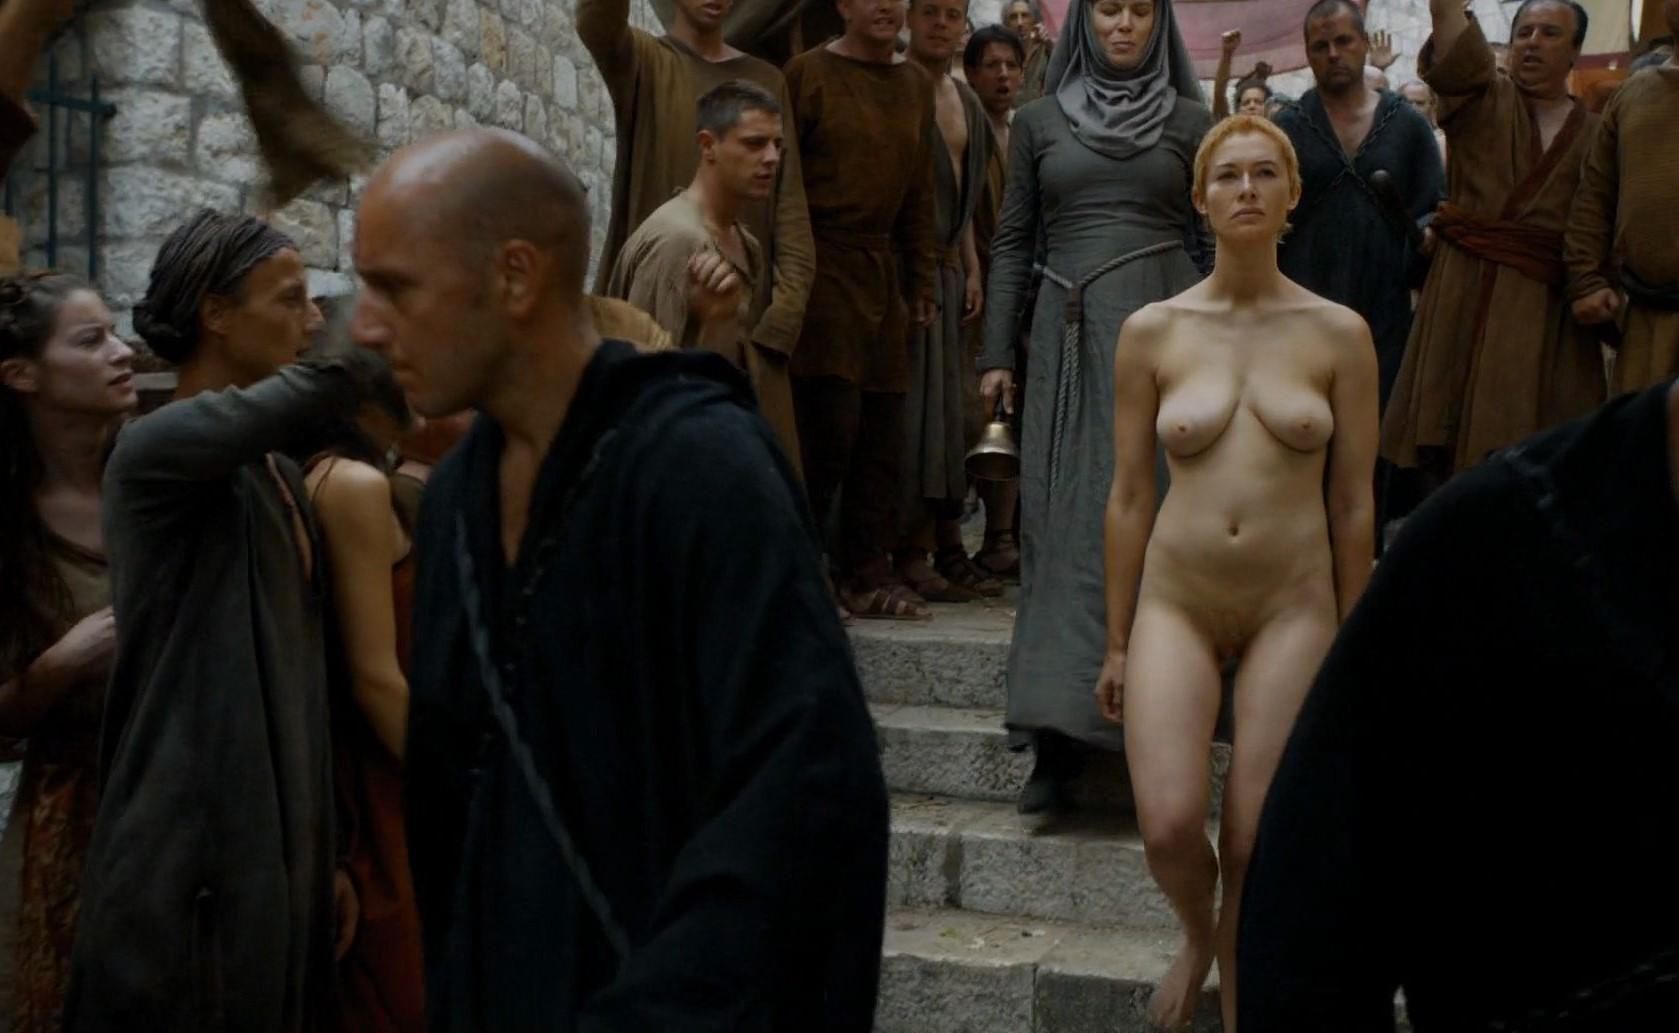 sex i skien nakne damer bilder